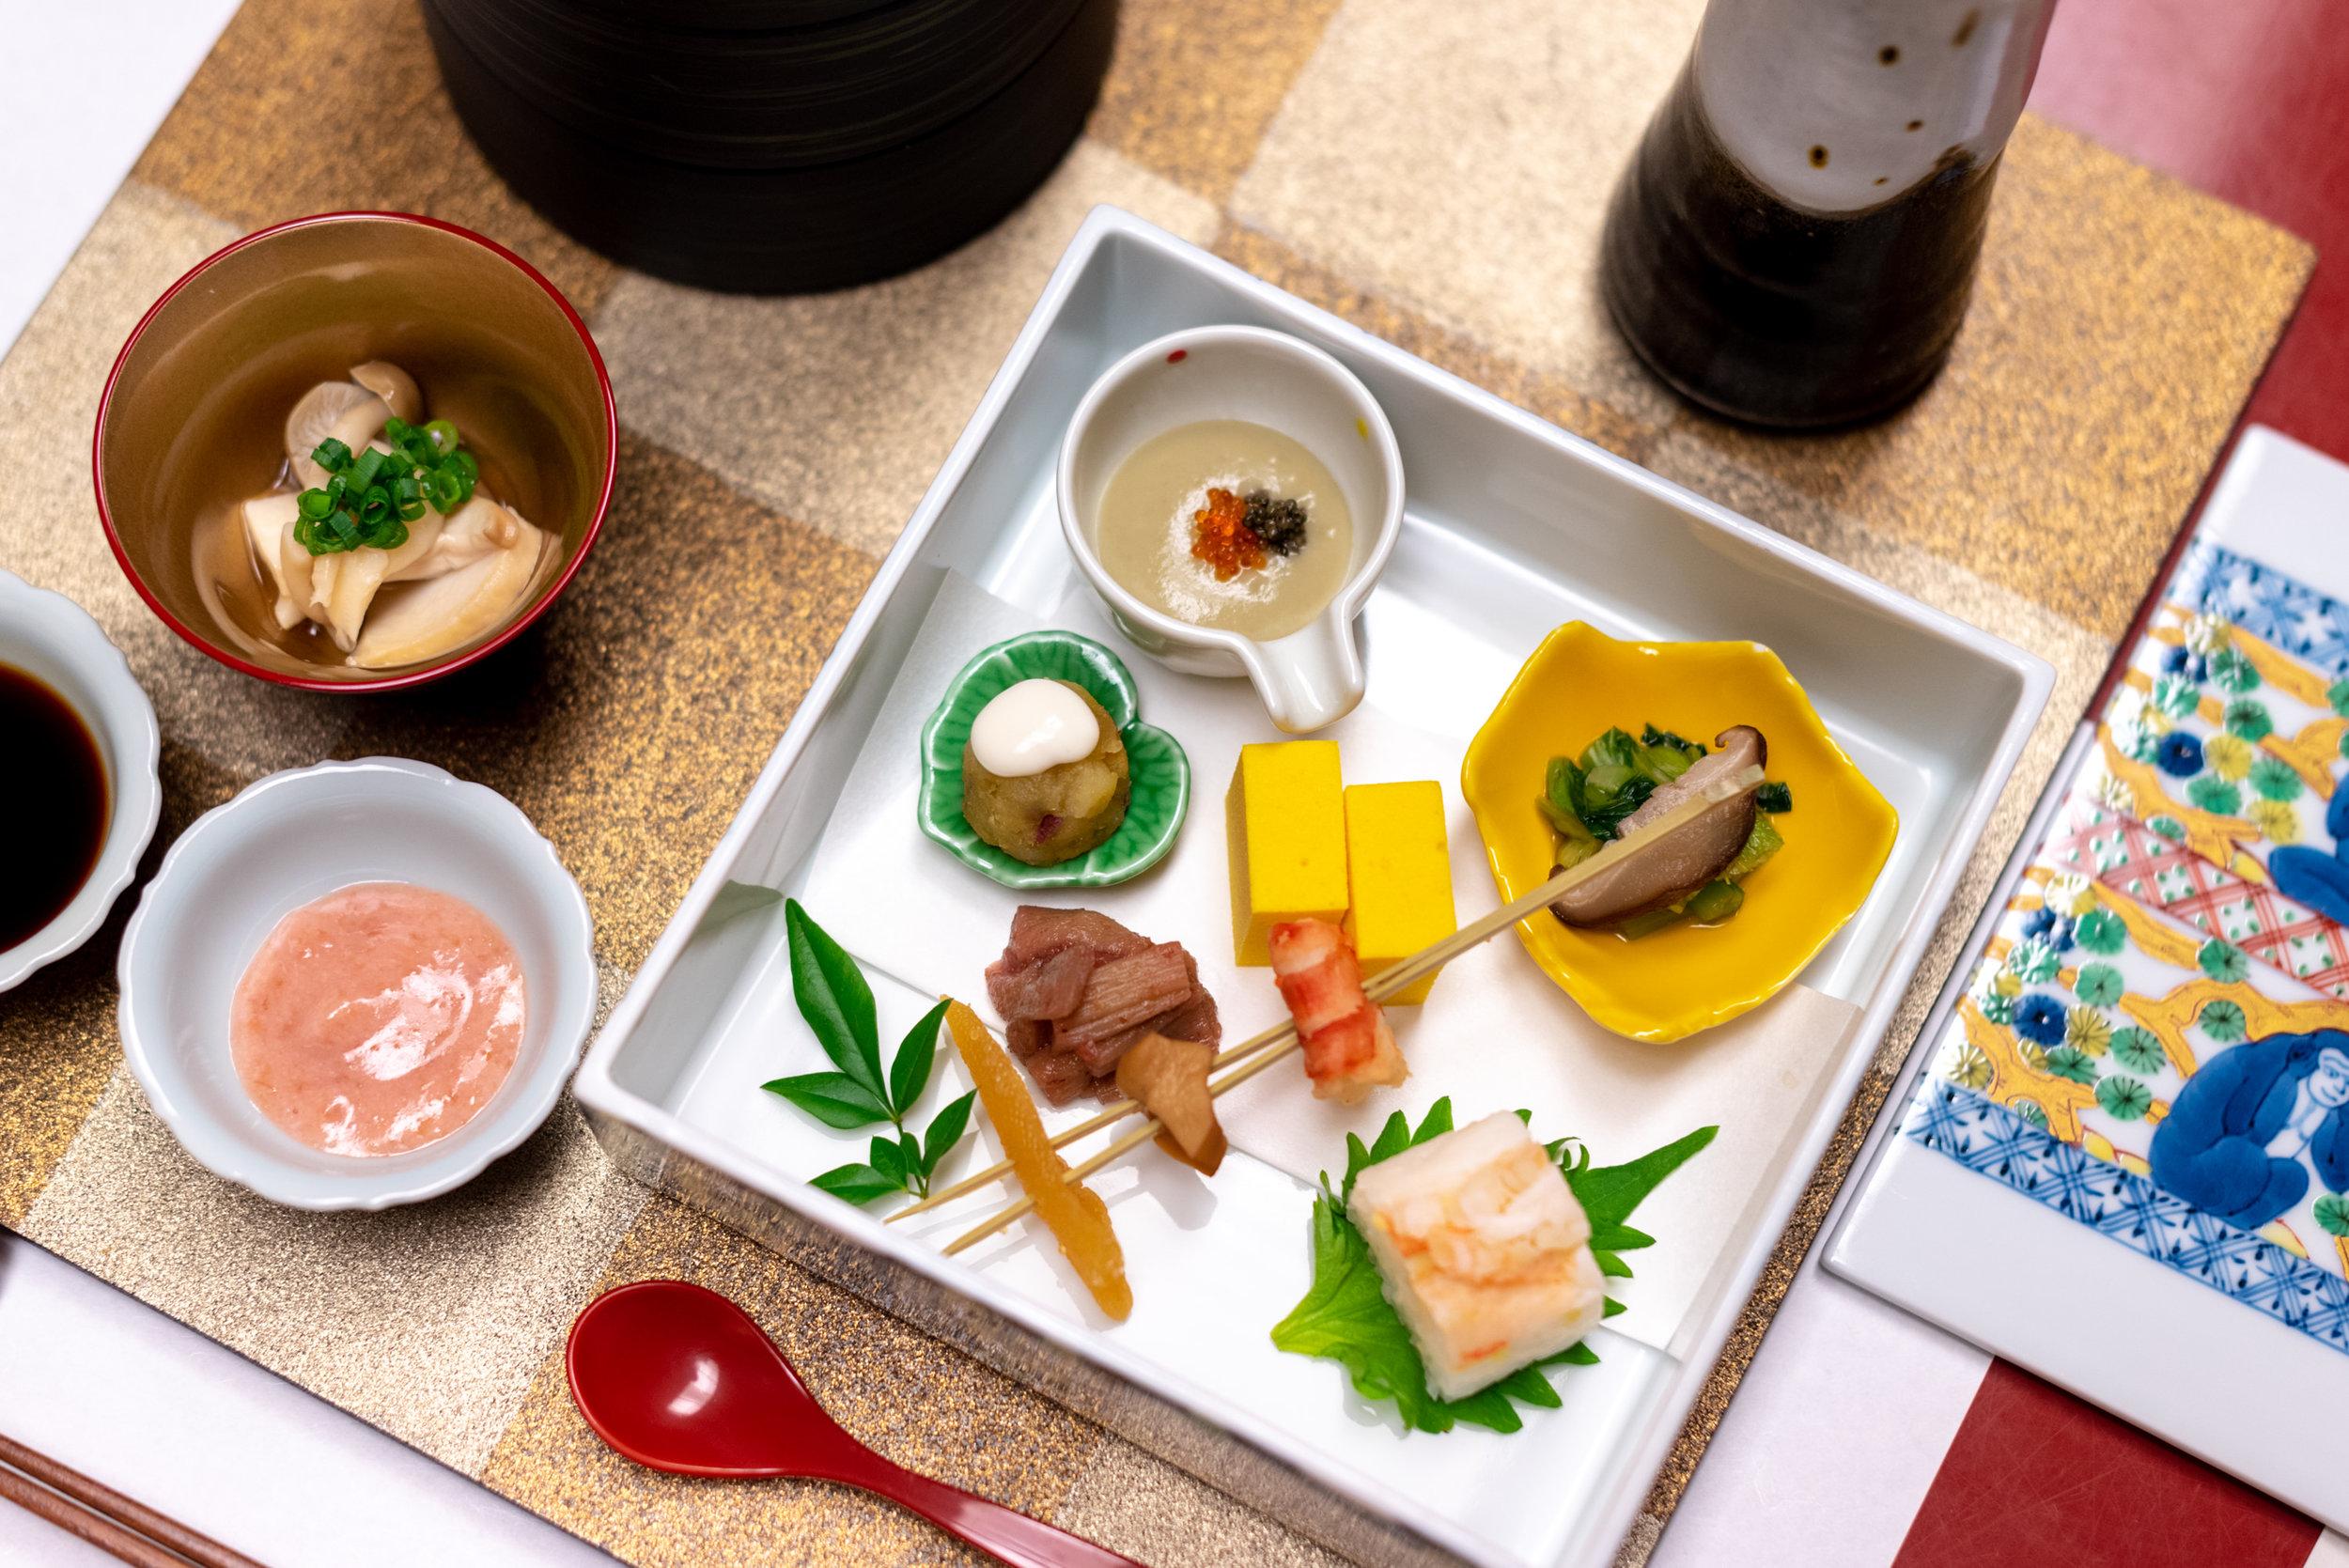 Assorted Delicacies  Dinner - Hoshino Resorts KAI Nikko